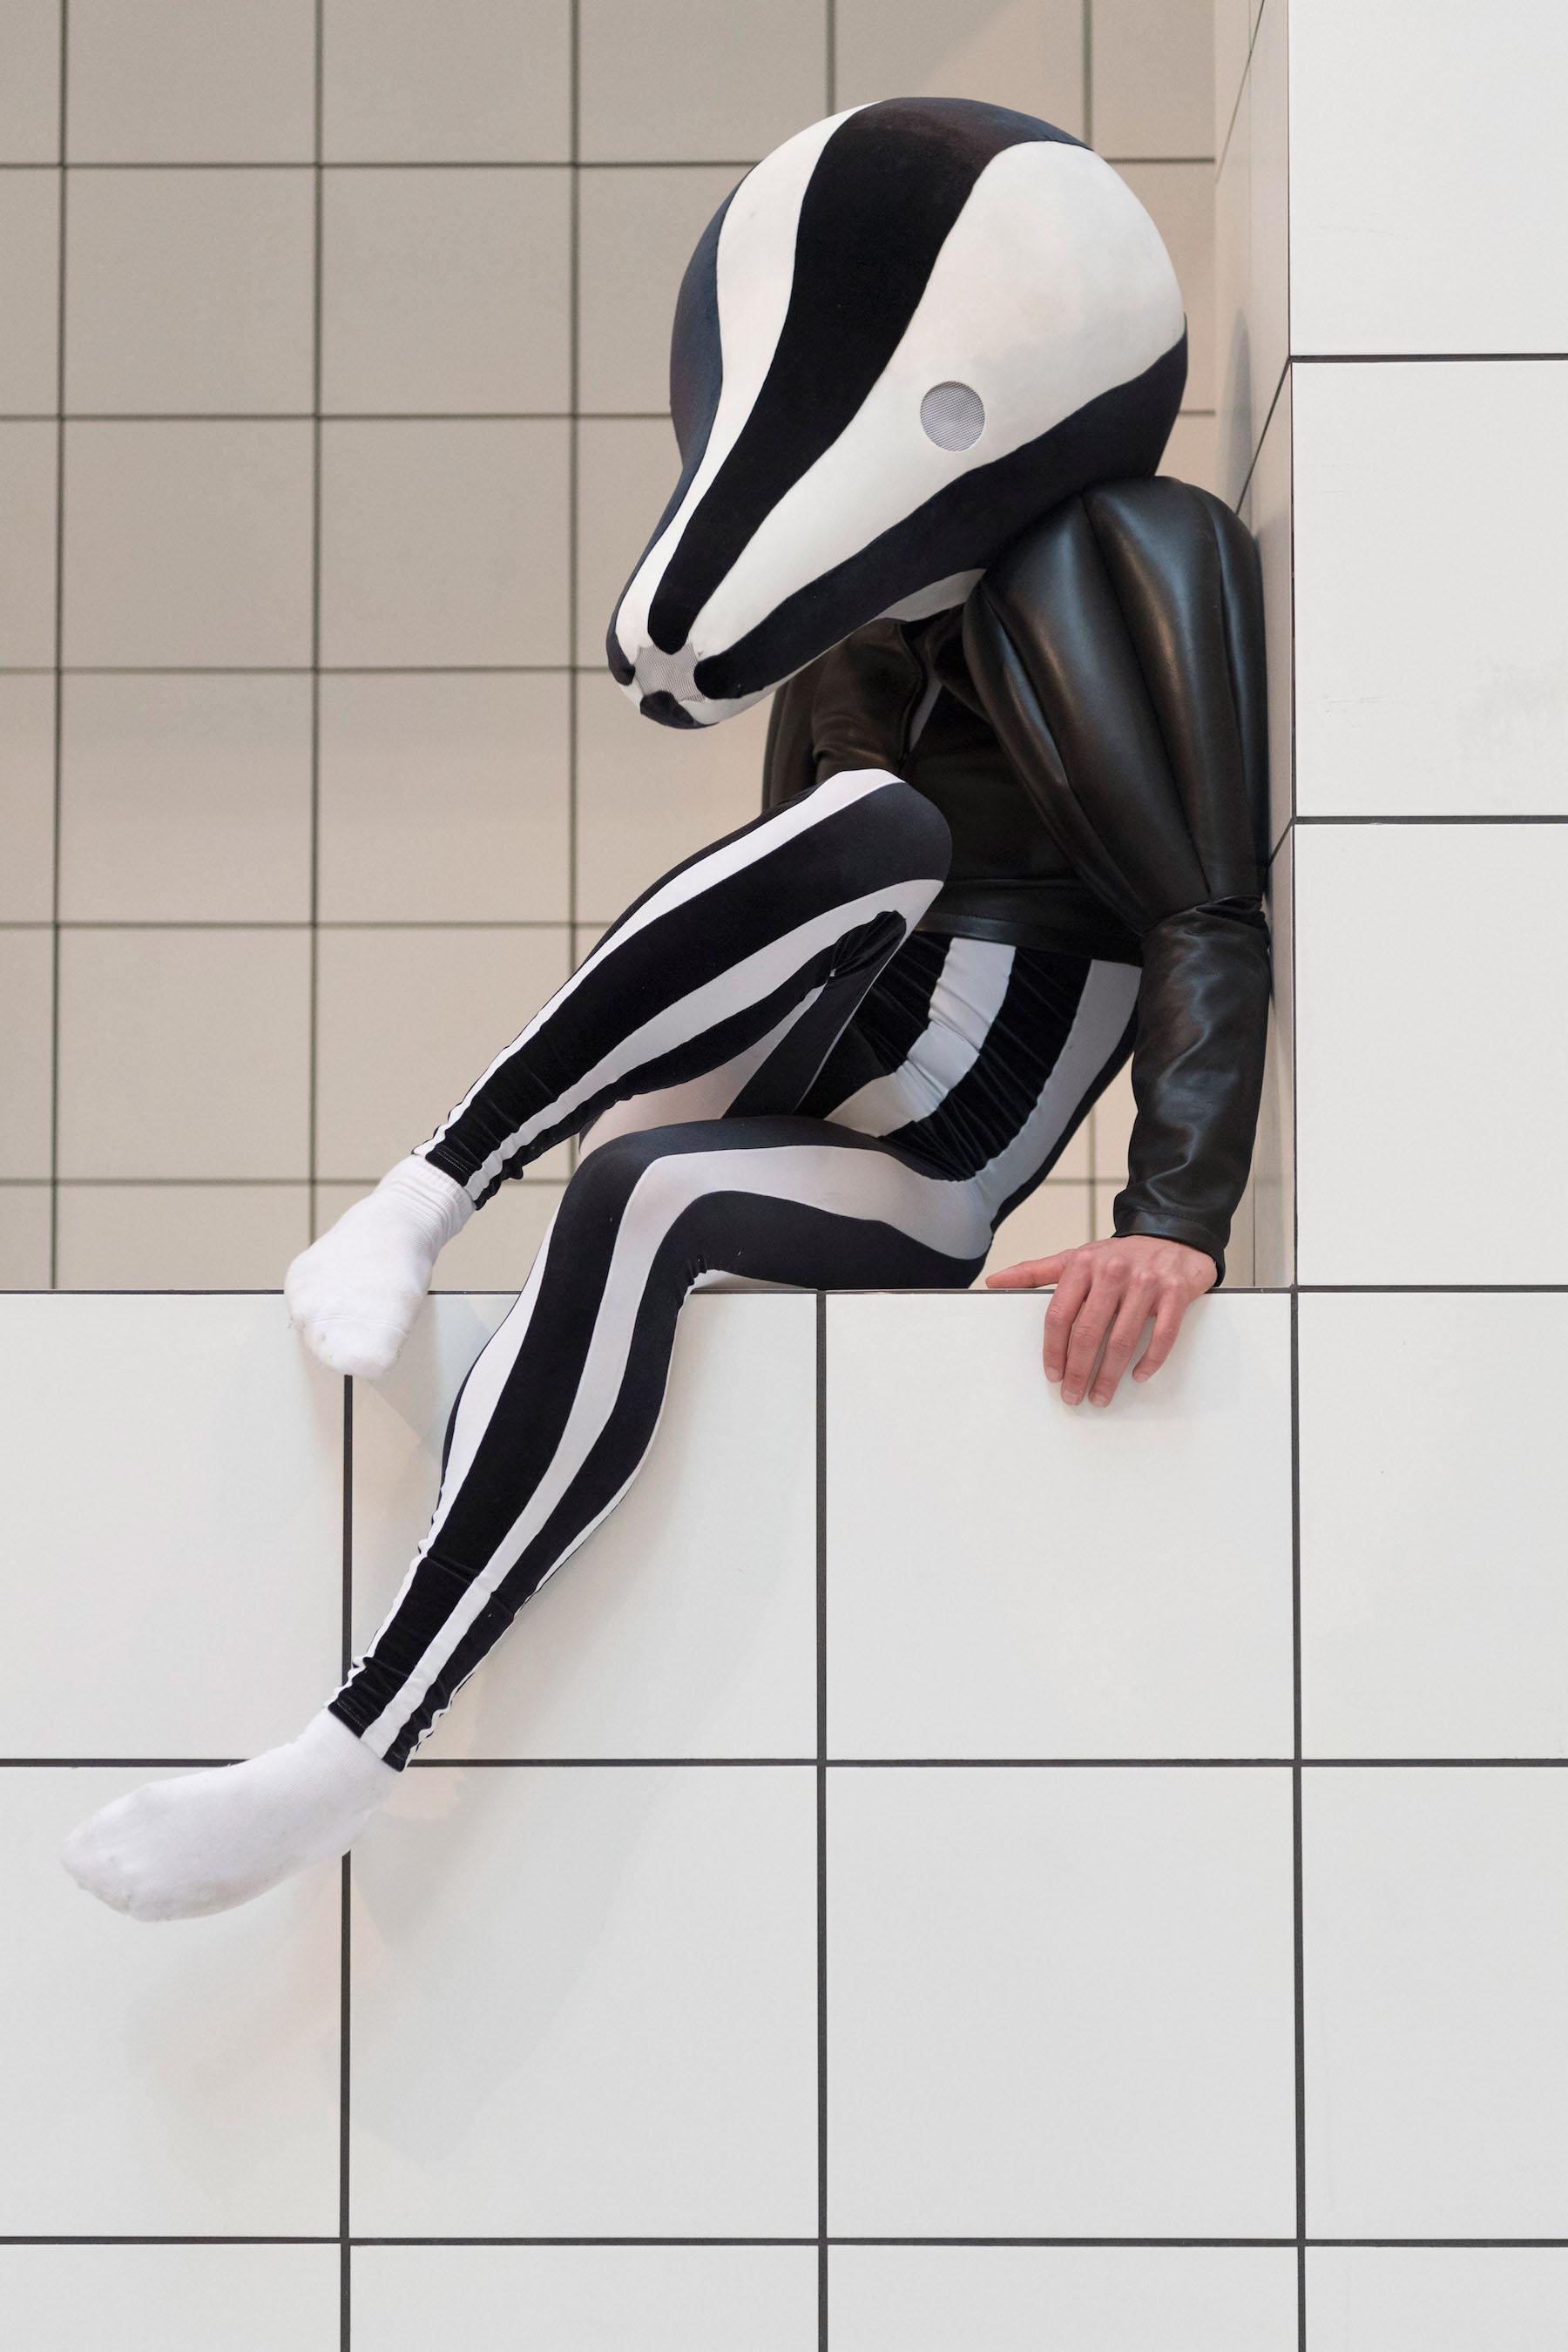 iGNANT-Fashion-Jonathan -Anderson-Anthea-Hamilton-The-Squash-04